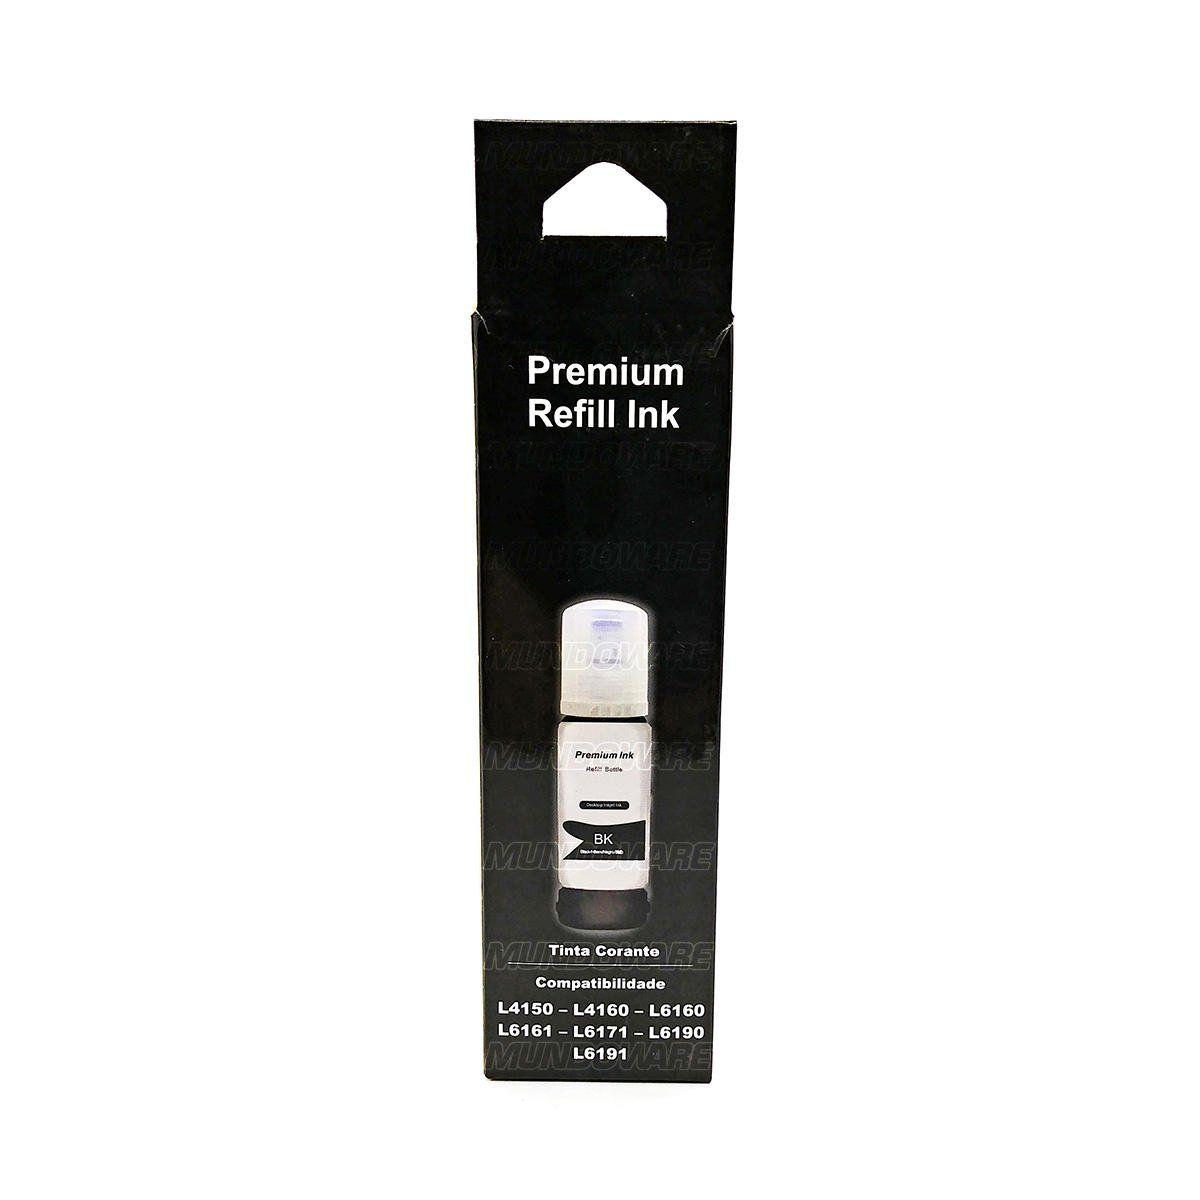 Compatível: Tinta Corante Laserteck para Epson L4150 L4160 L6160 L6161 L6171 L6190 L6191 4150 6161 6190 / Preto / 70ml